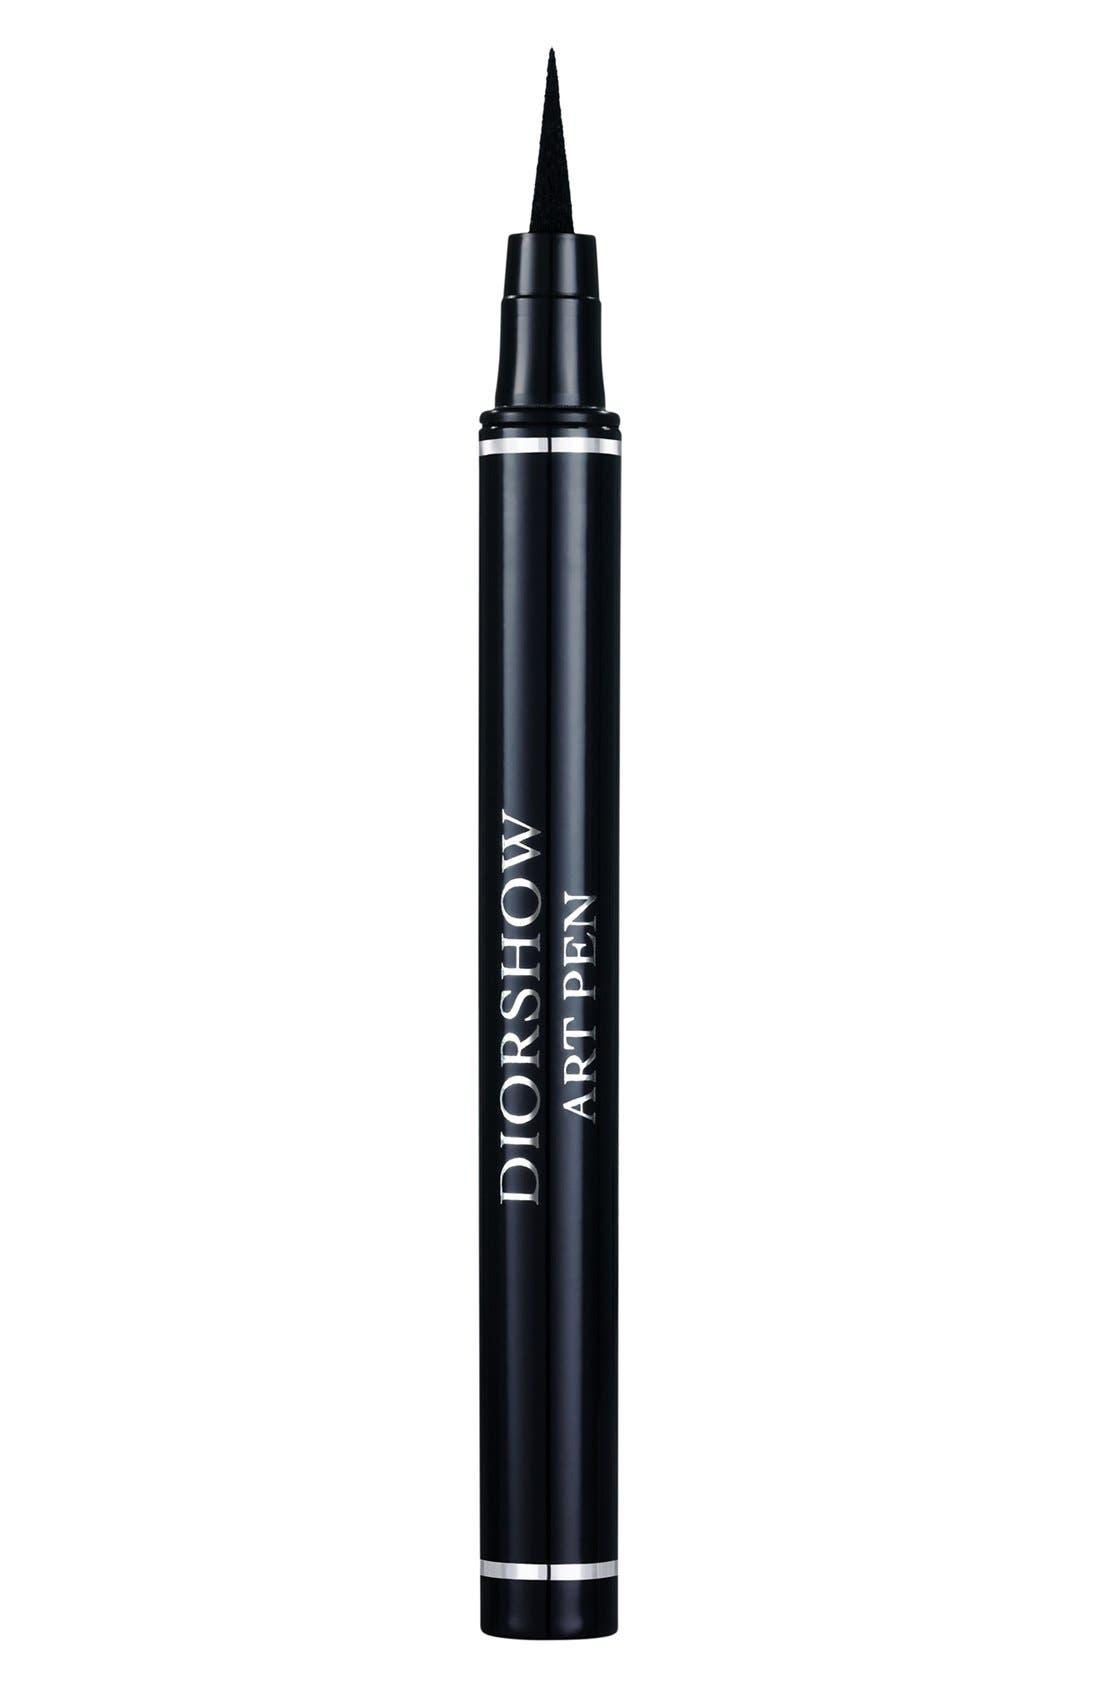 'Diorshow Art Pen' Eyeliner,                             Main thumbnail 1, color,                             001